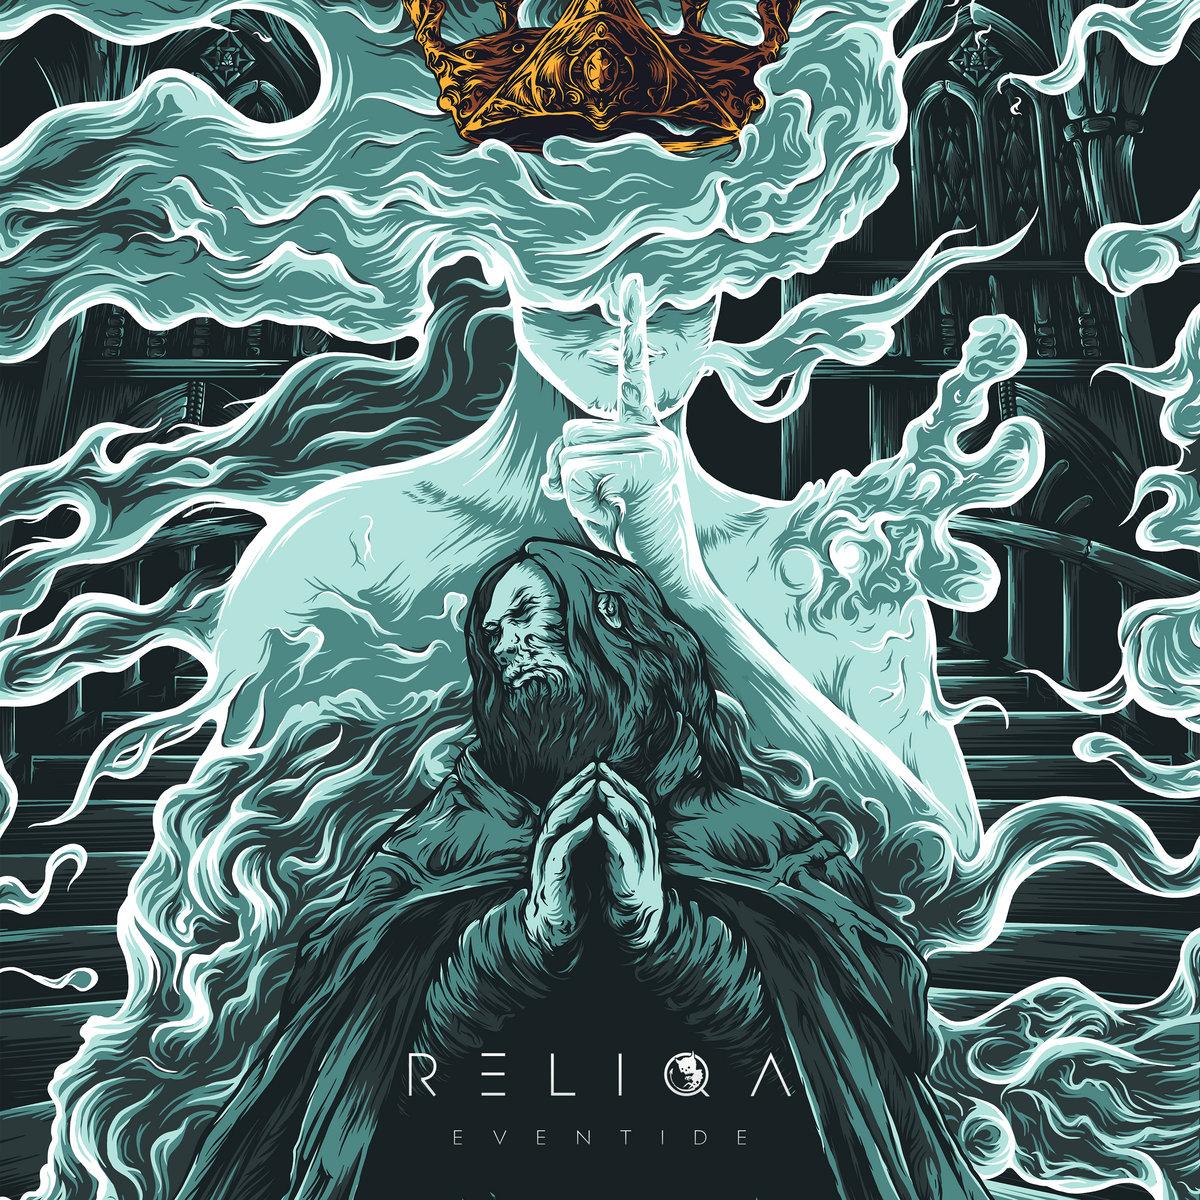 Reliqa - Eventide (2018)